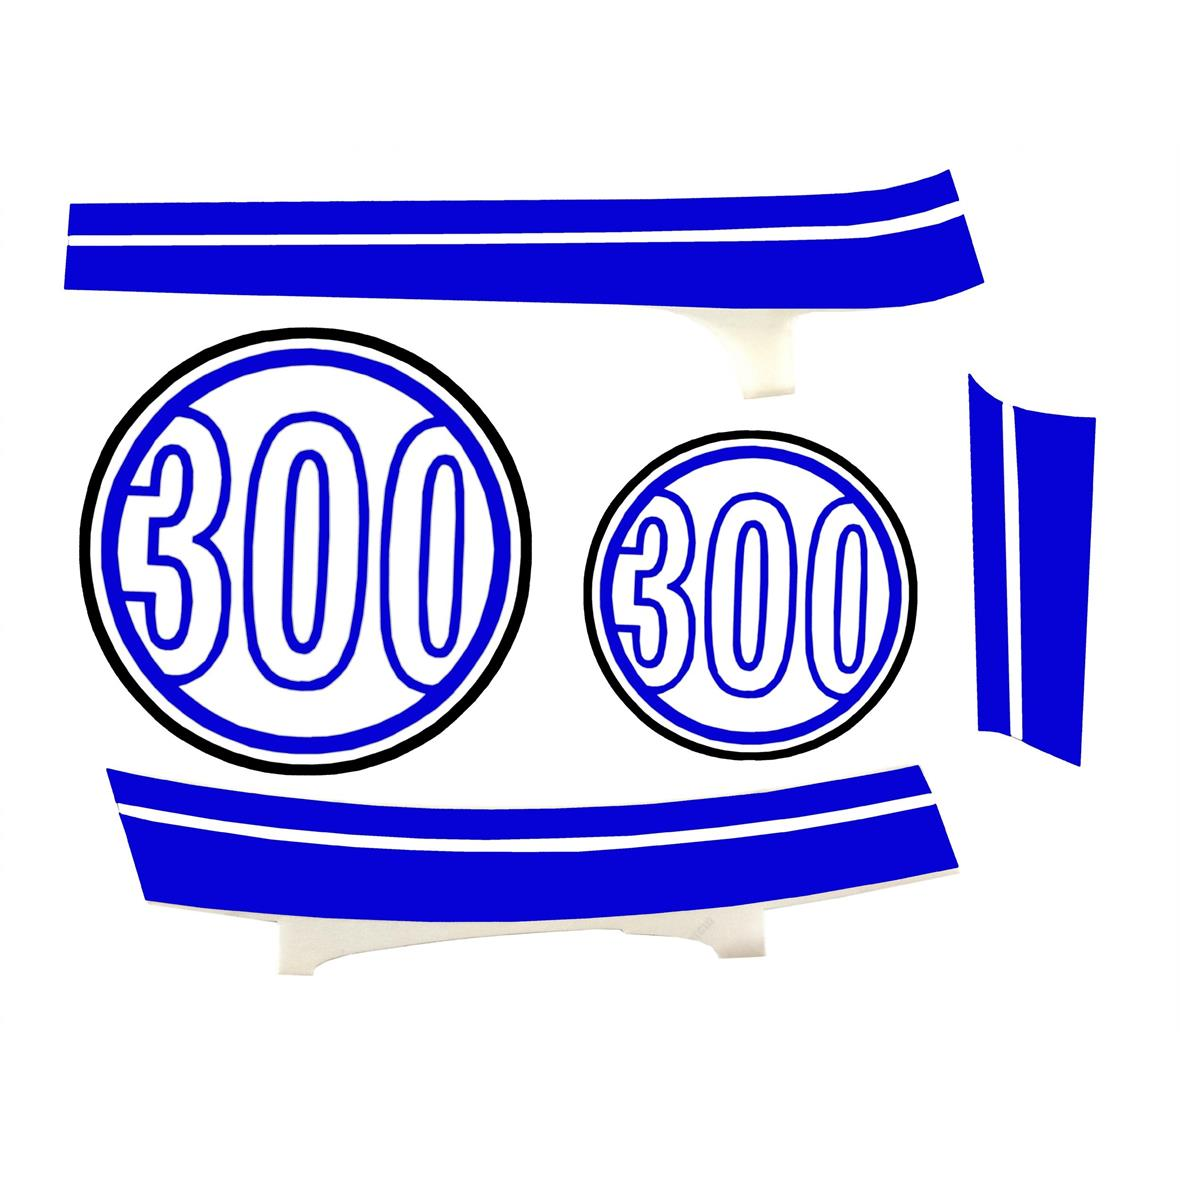 "Product Image for 'Sticker Decoration Set PIAGGIO ""300""Title'"